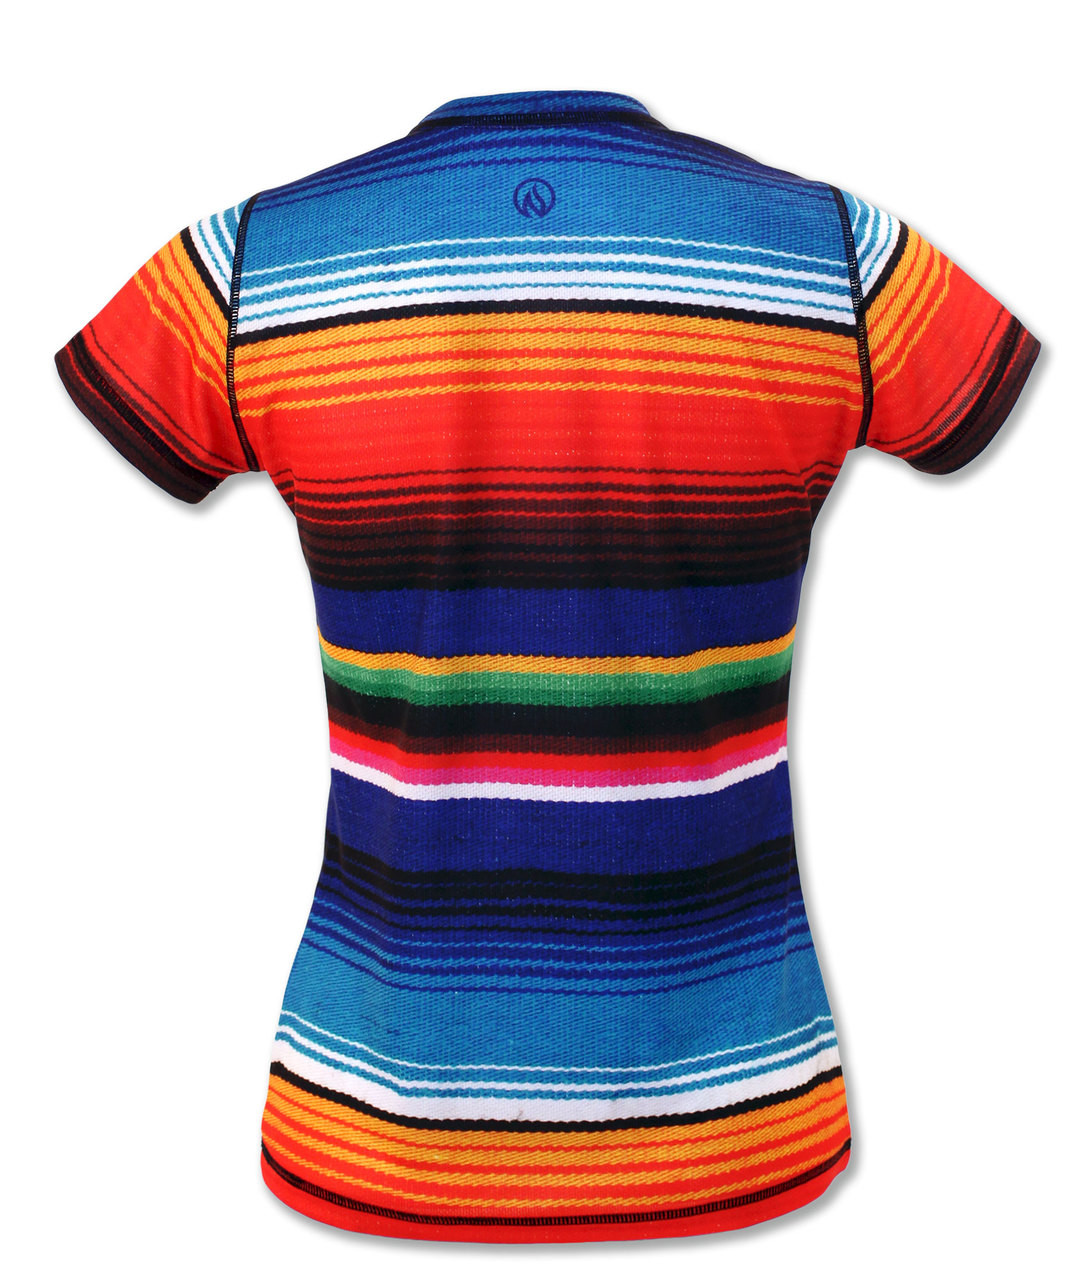 INKnBURN Women's Serape Tech Shirt Back